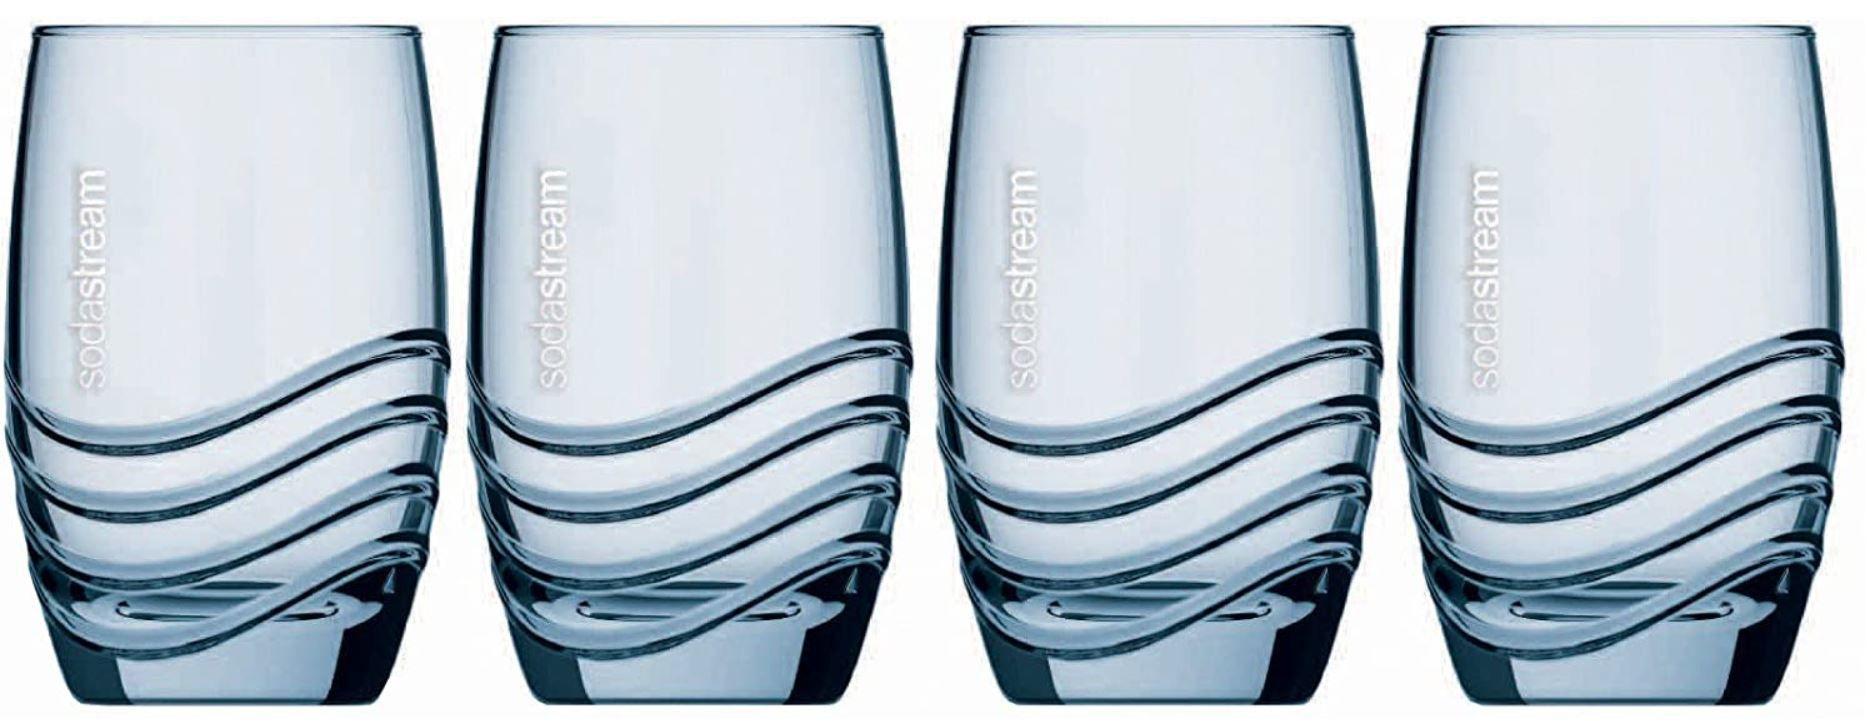 SodaStream Designglas by Rastal 4er Pack (je 330ml) für 12,59€ (statt 17€)